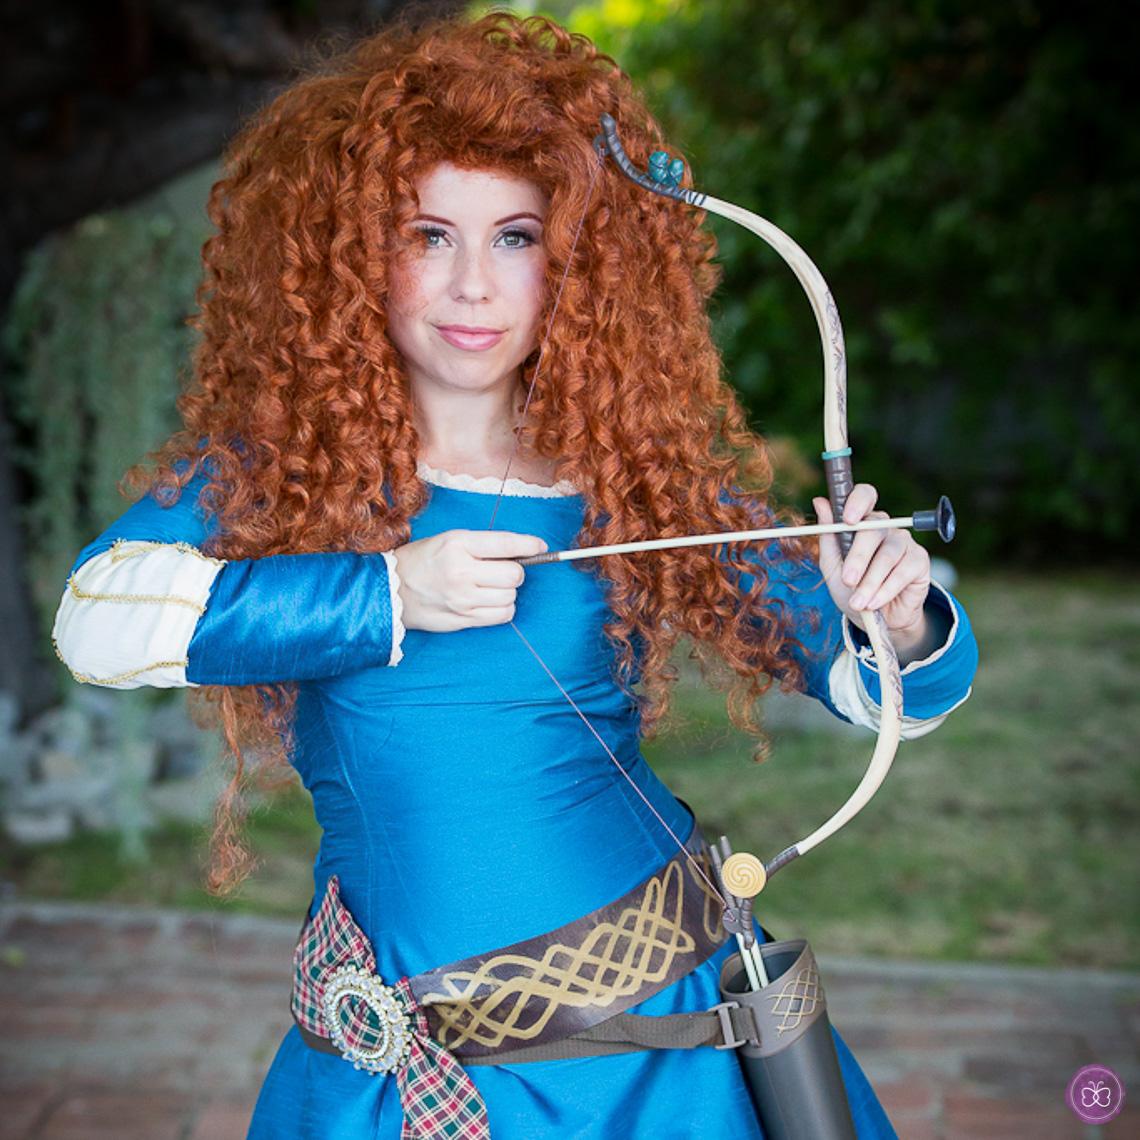 Merida Brave princess party character Los Angeles